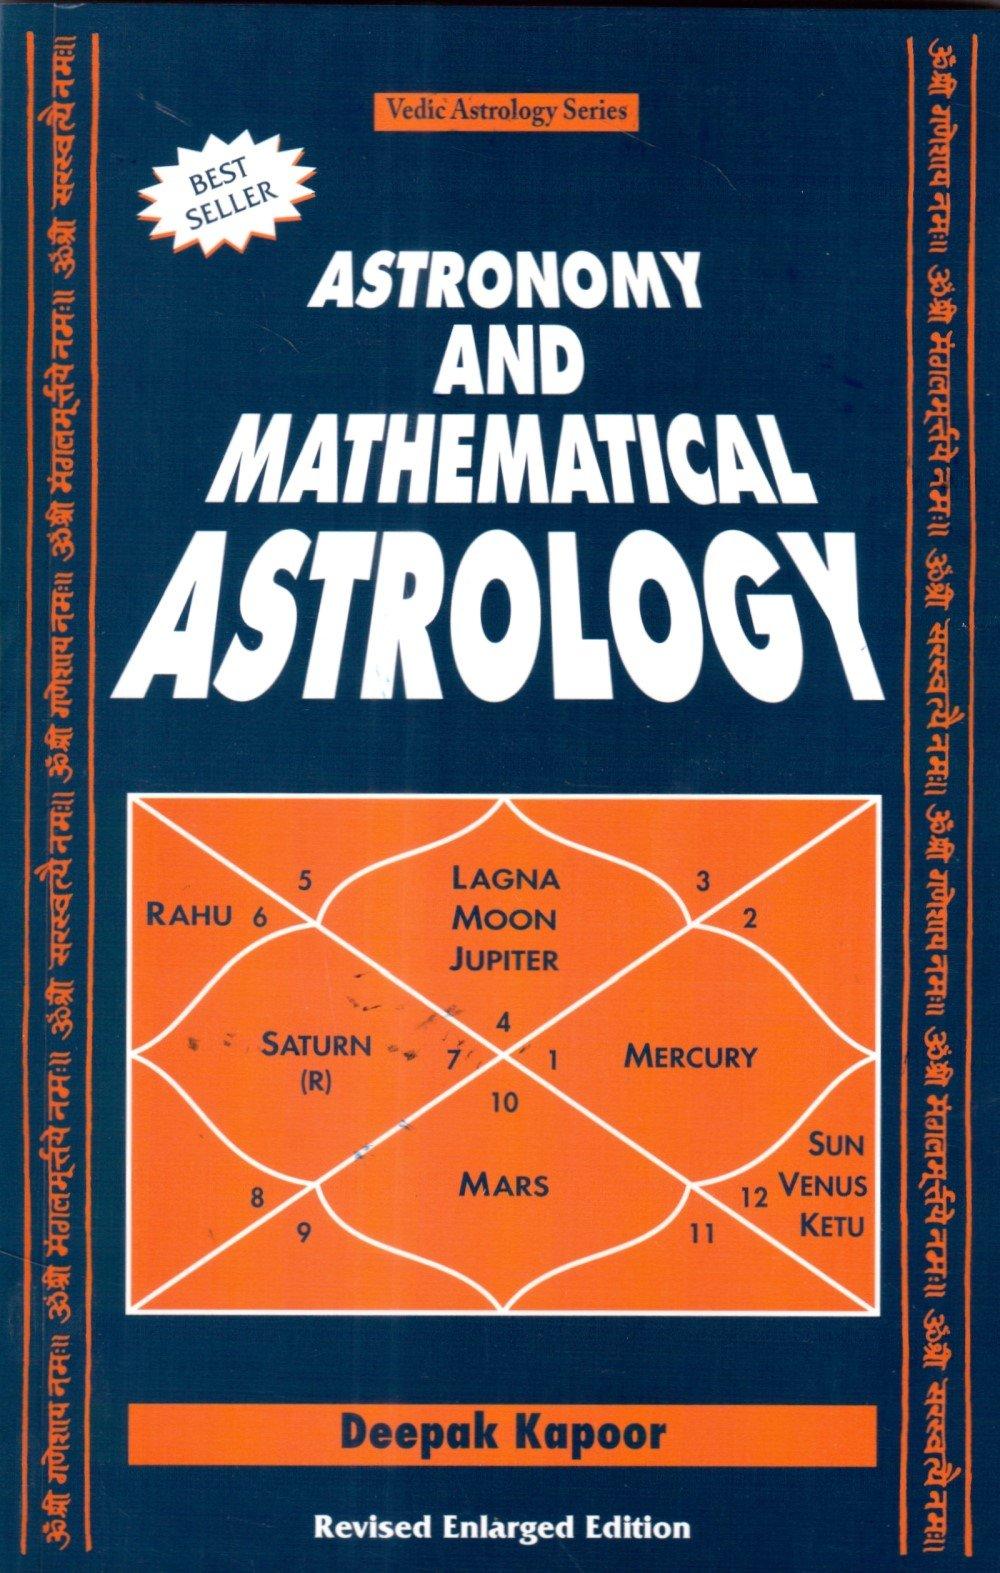 deepak kapoor astrologer in hindi